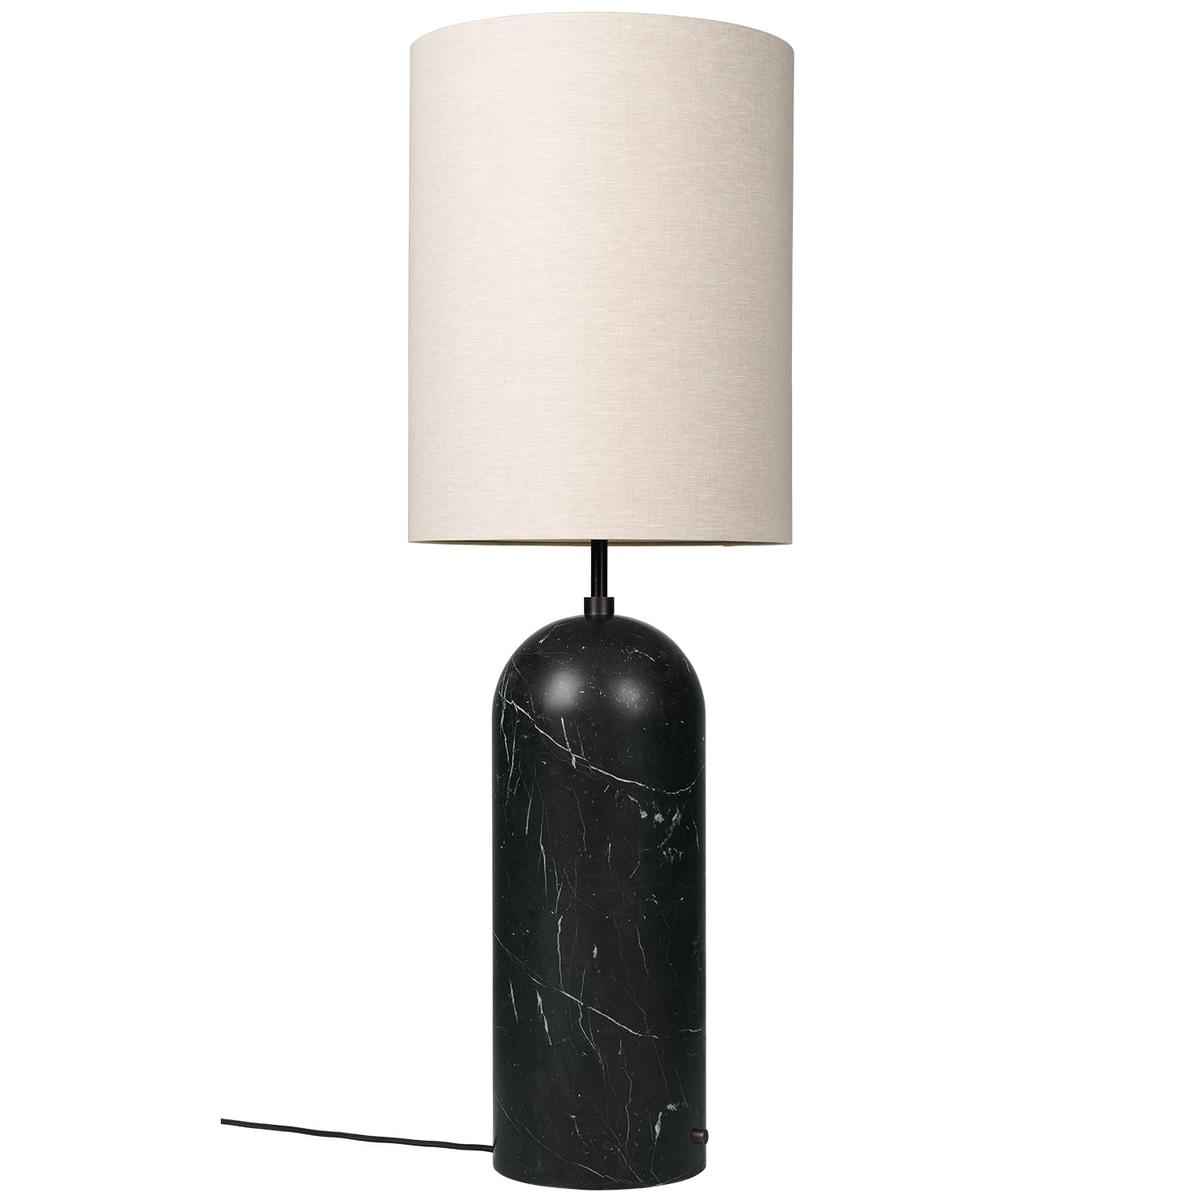 Gubi Gravity Xl Floor Lamp, High, Black Marble - Canvas